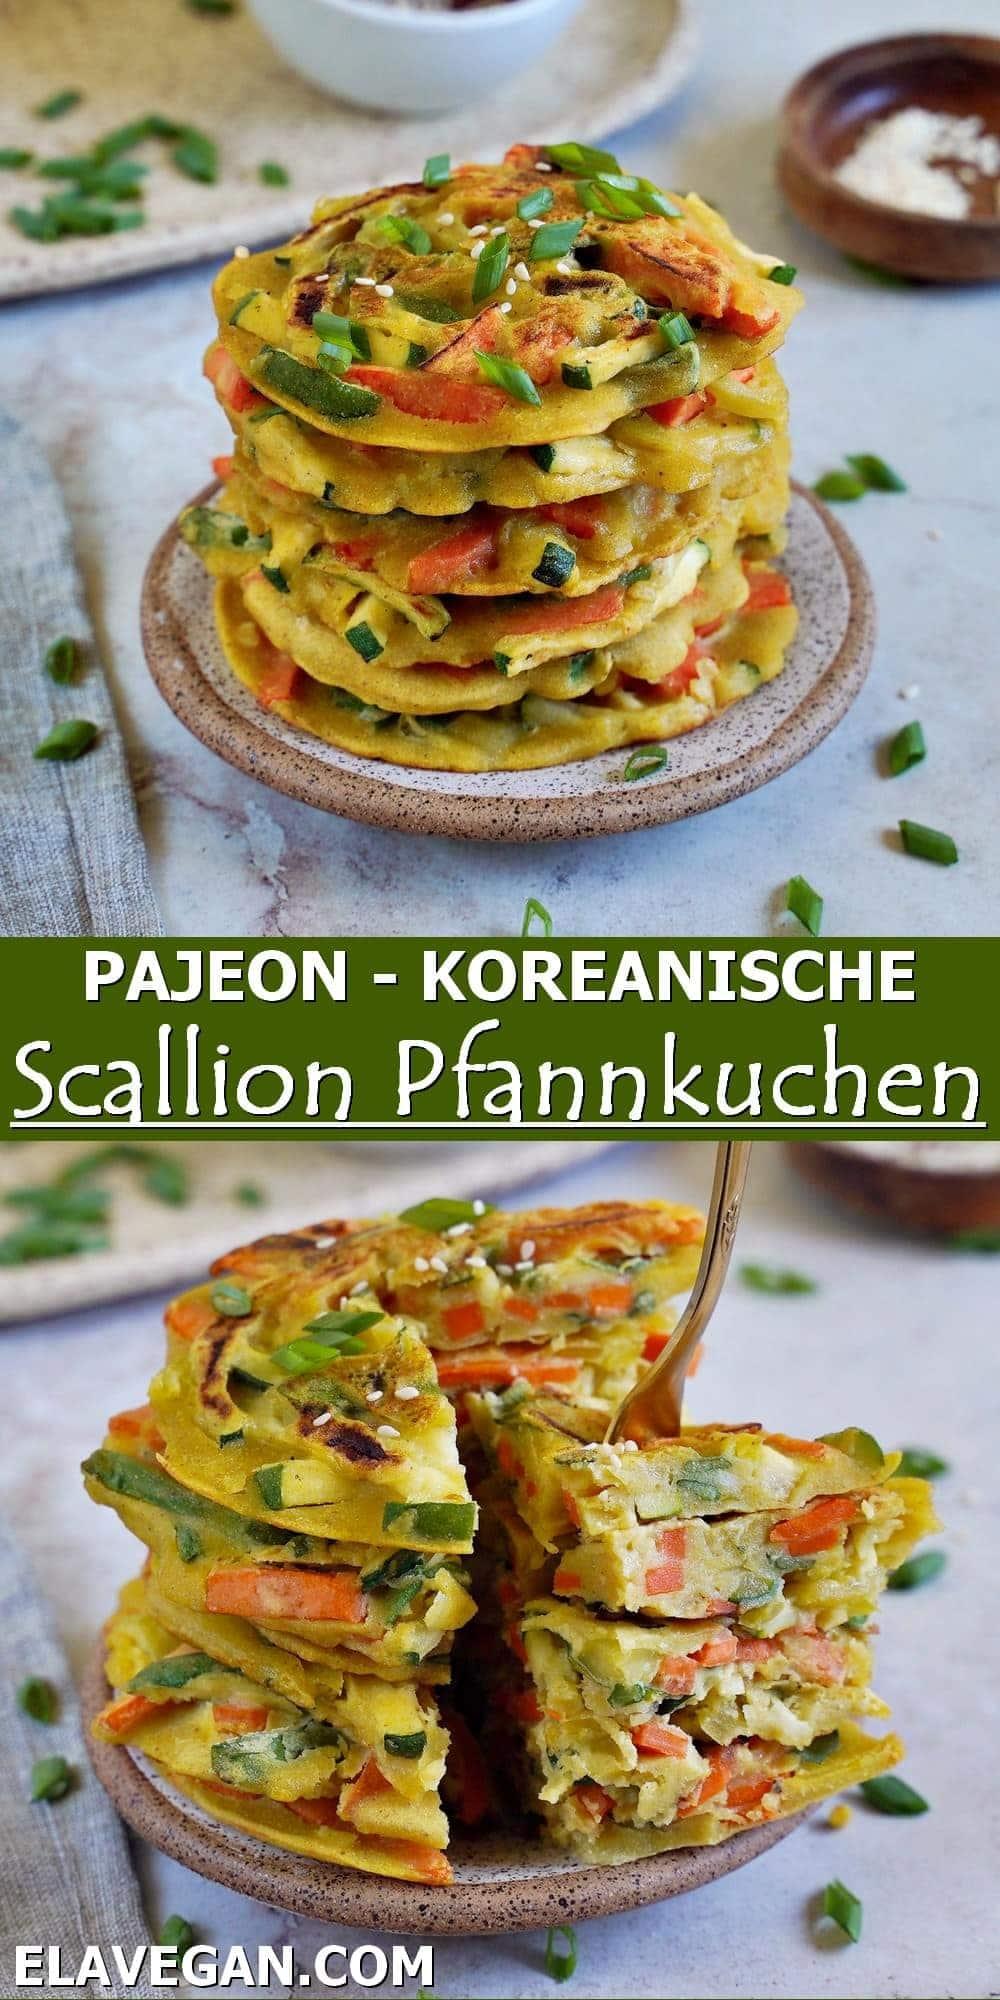 Pinterest Pajeon - Koreanische Scallion Pfannkuchen